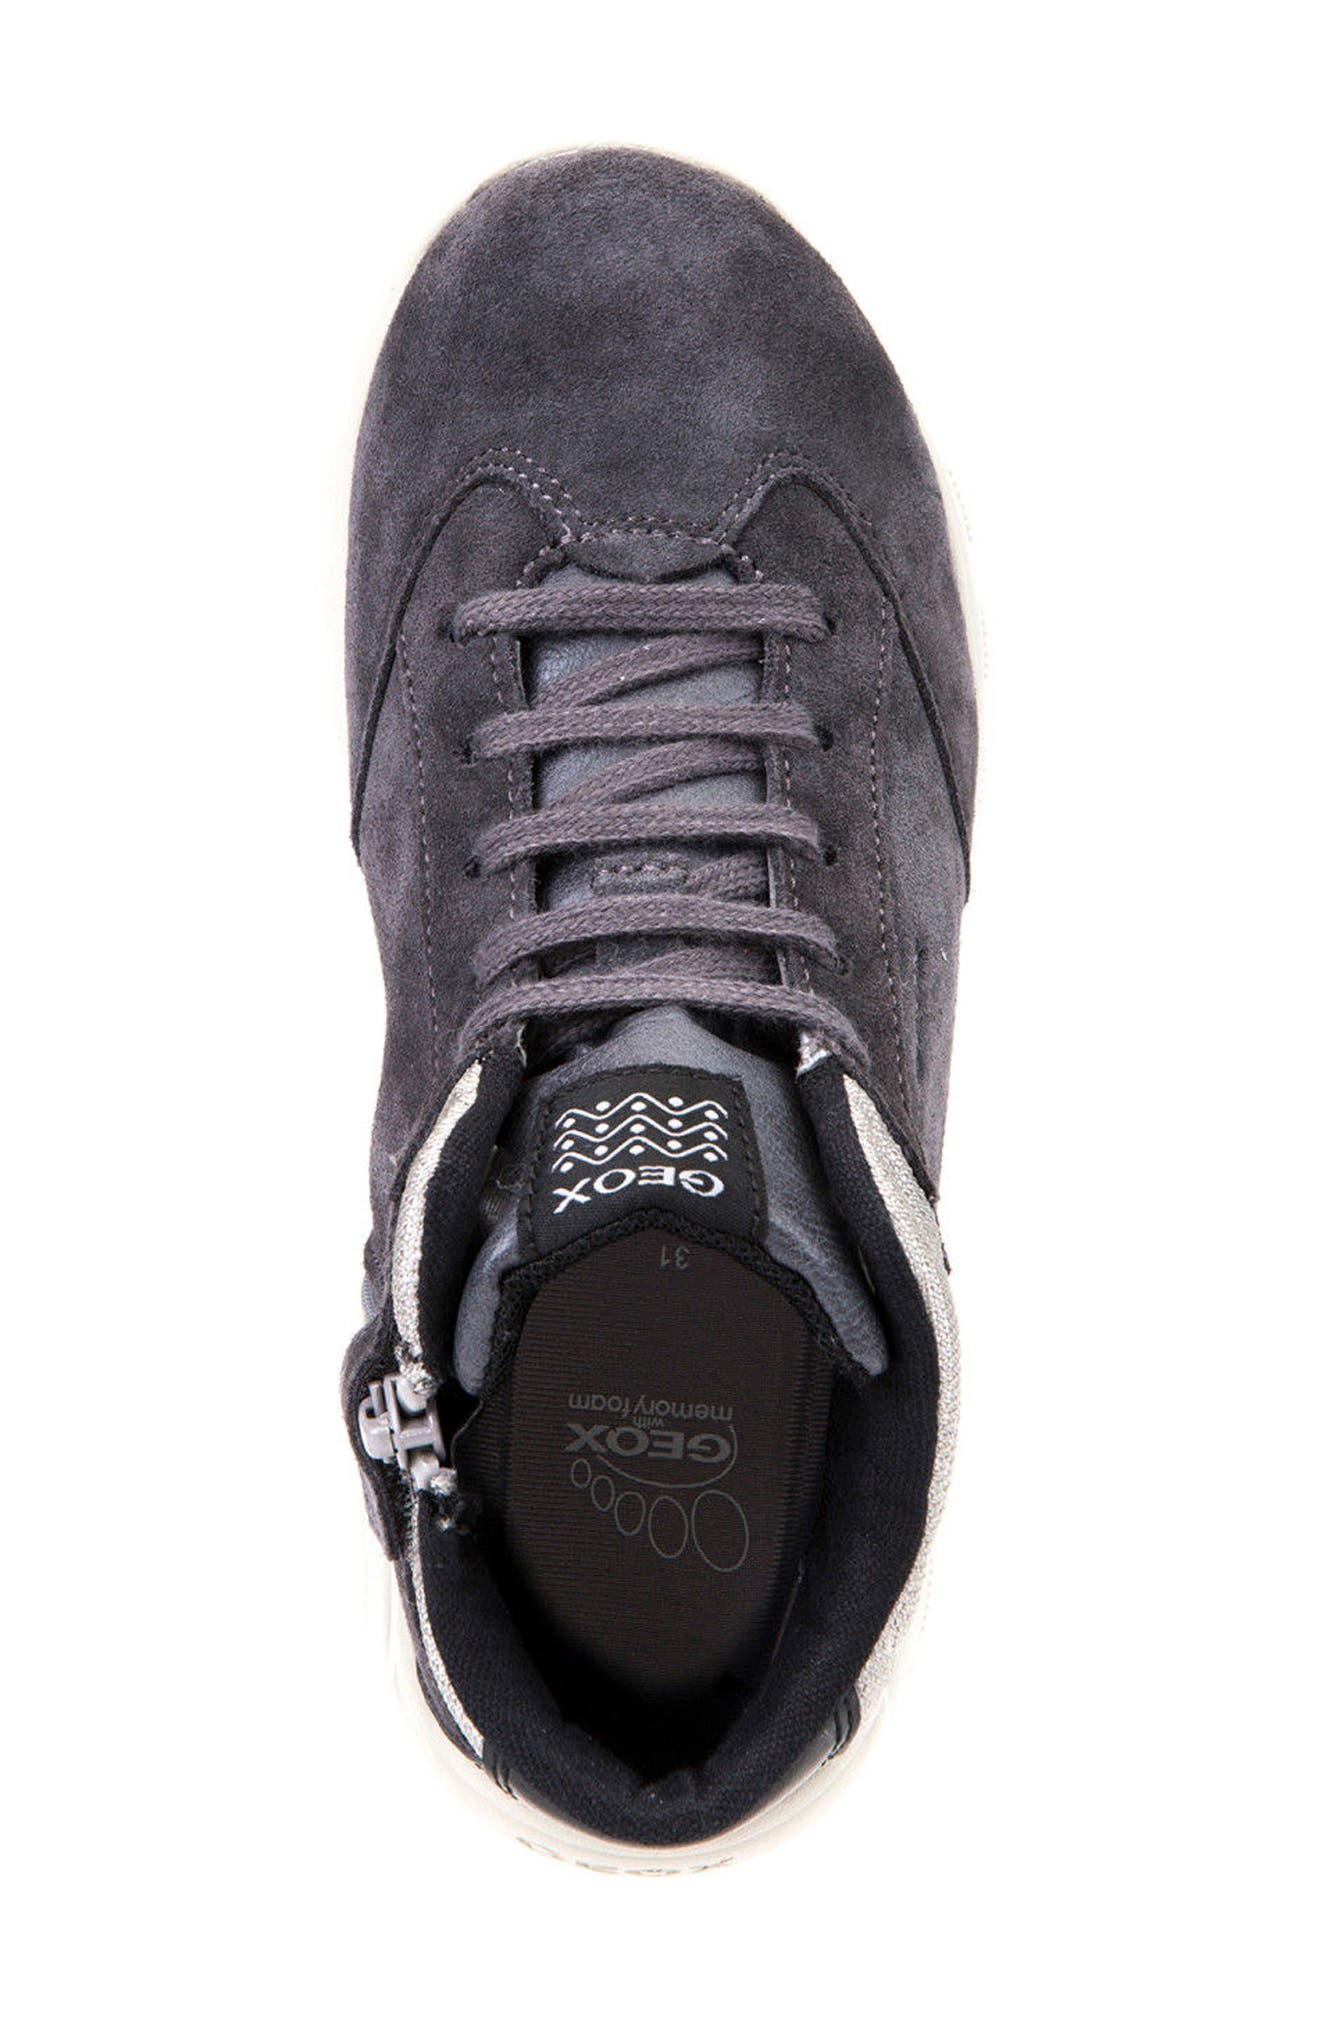 Xunday Mid Top Sneaker,                             Alternate thumbnail 5, color,                             Grey/ Light Grey